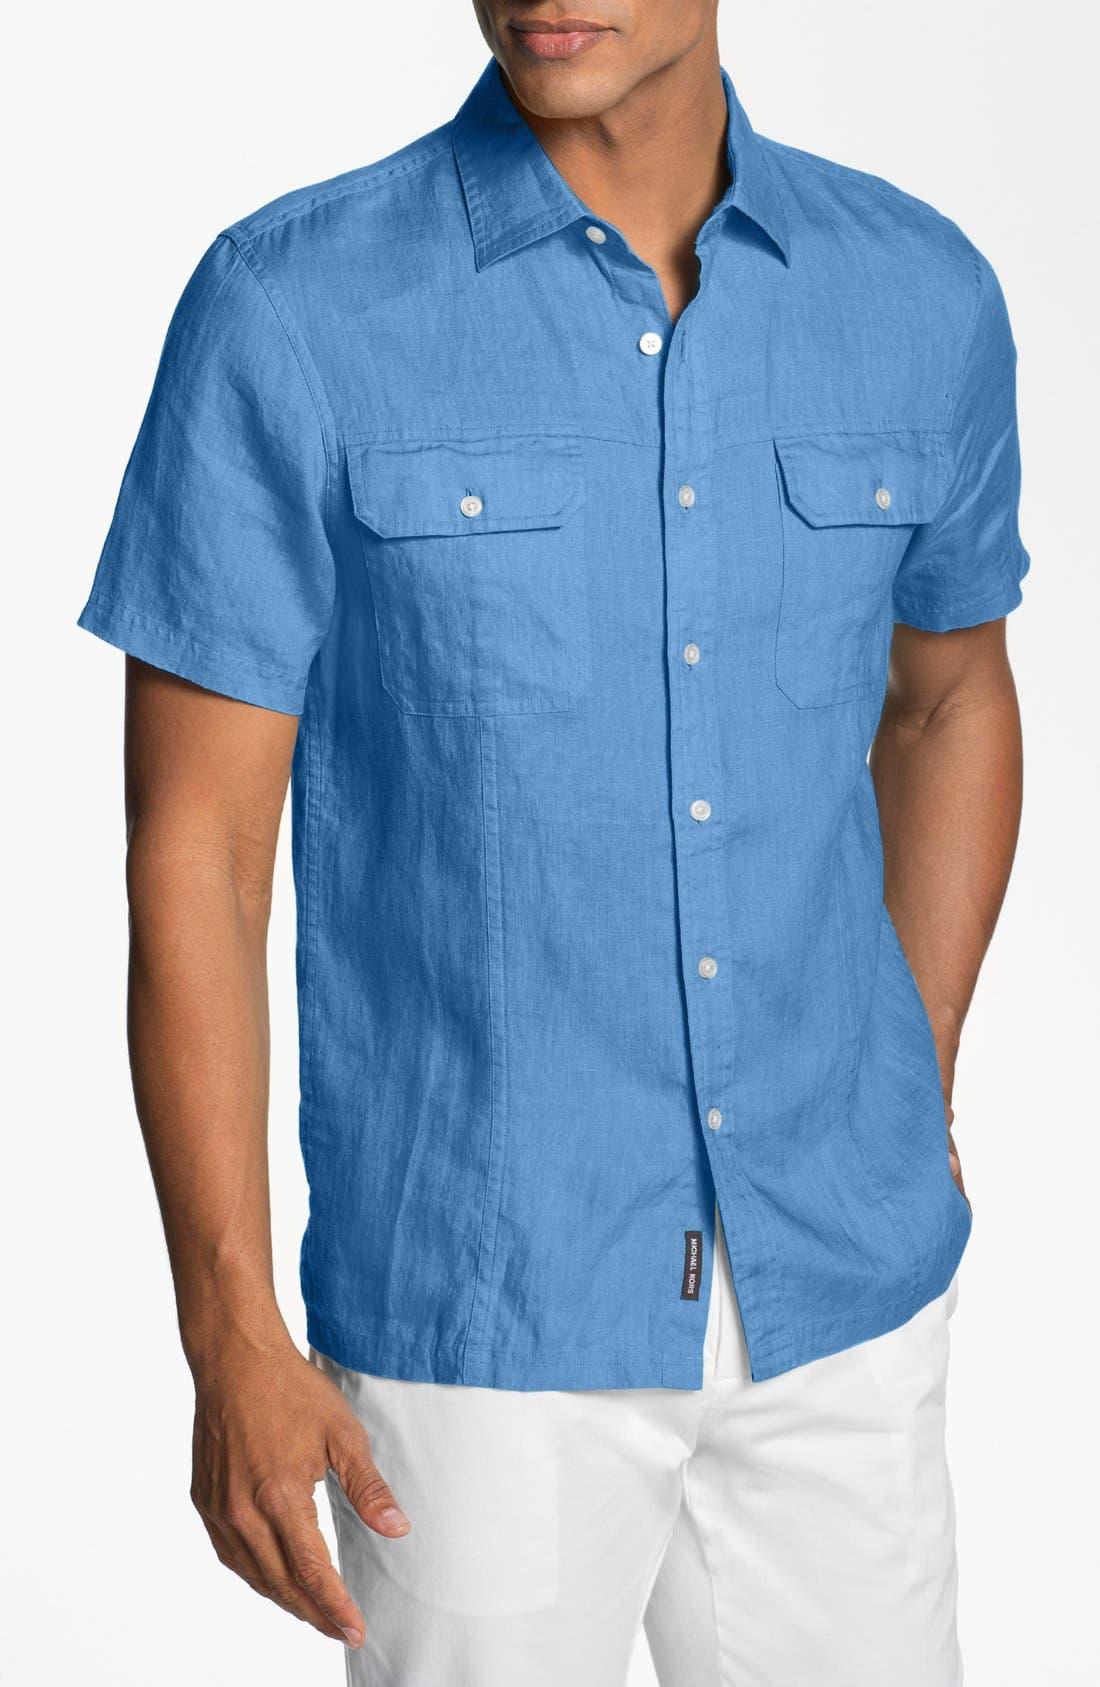 Alternate Image 1 Selected - Michael Kors Tailored Fit Linen Sport Shirt